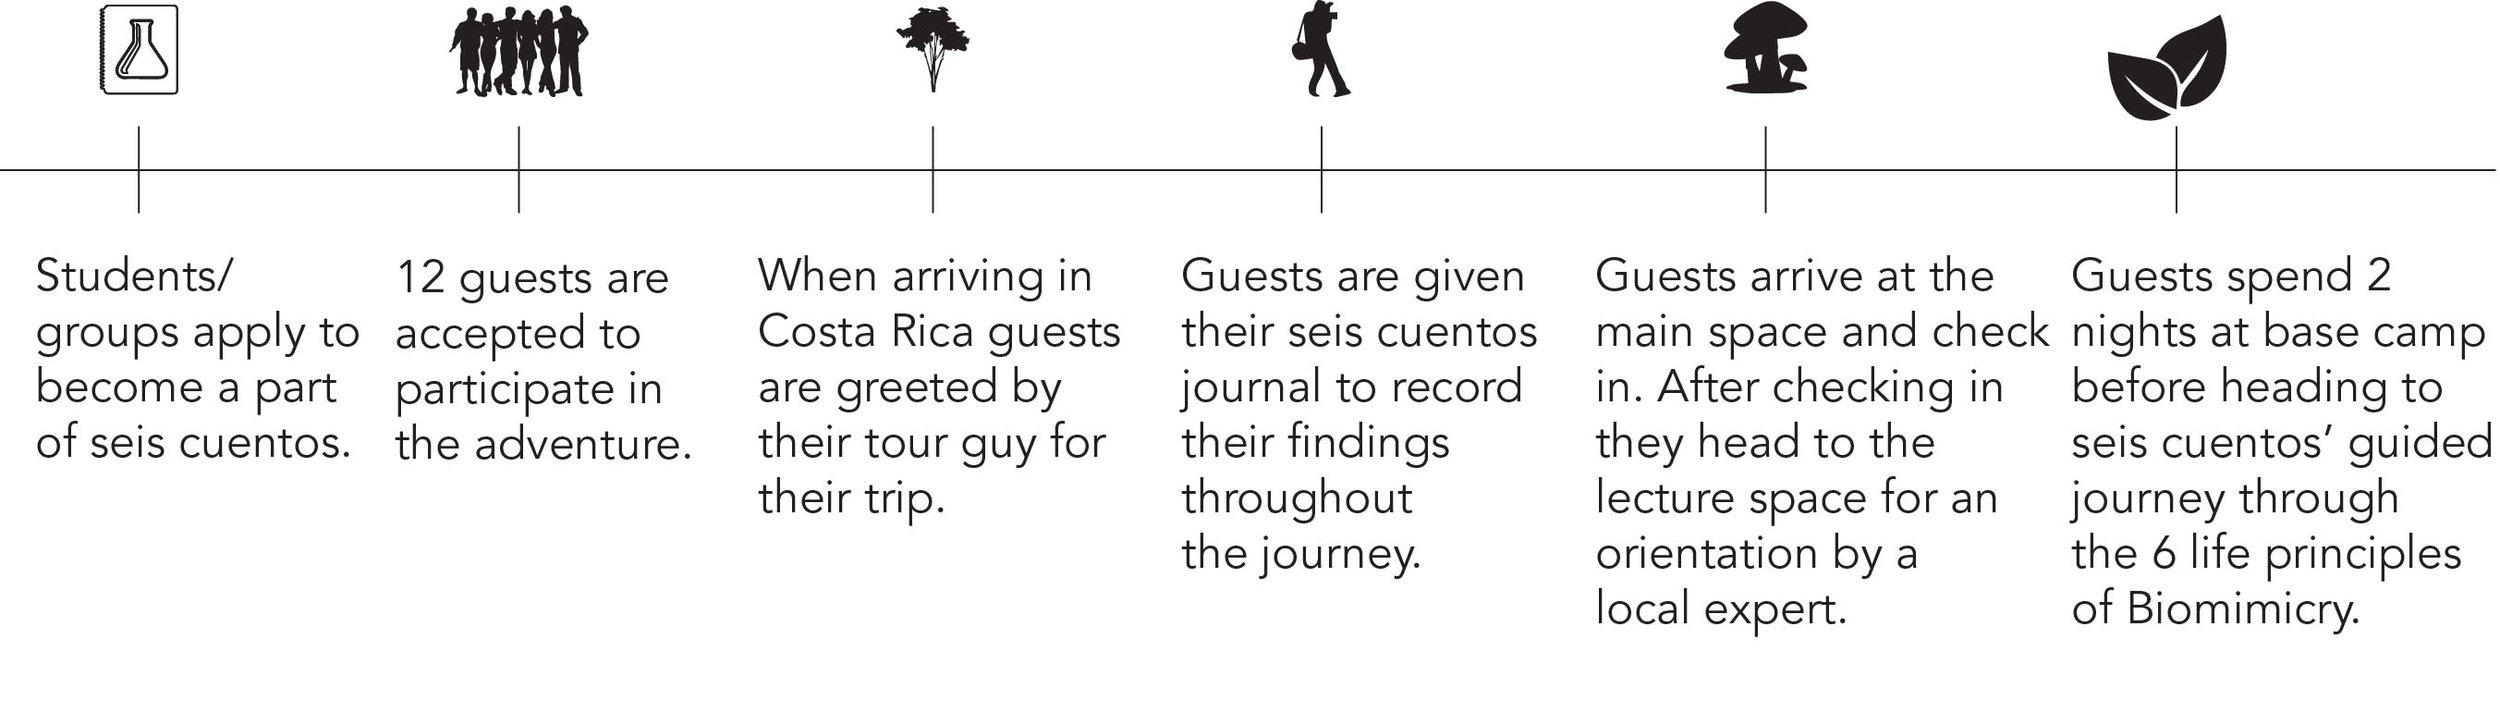 Costa_Rica_Journey.jpg